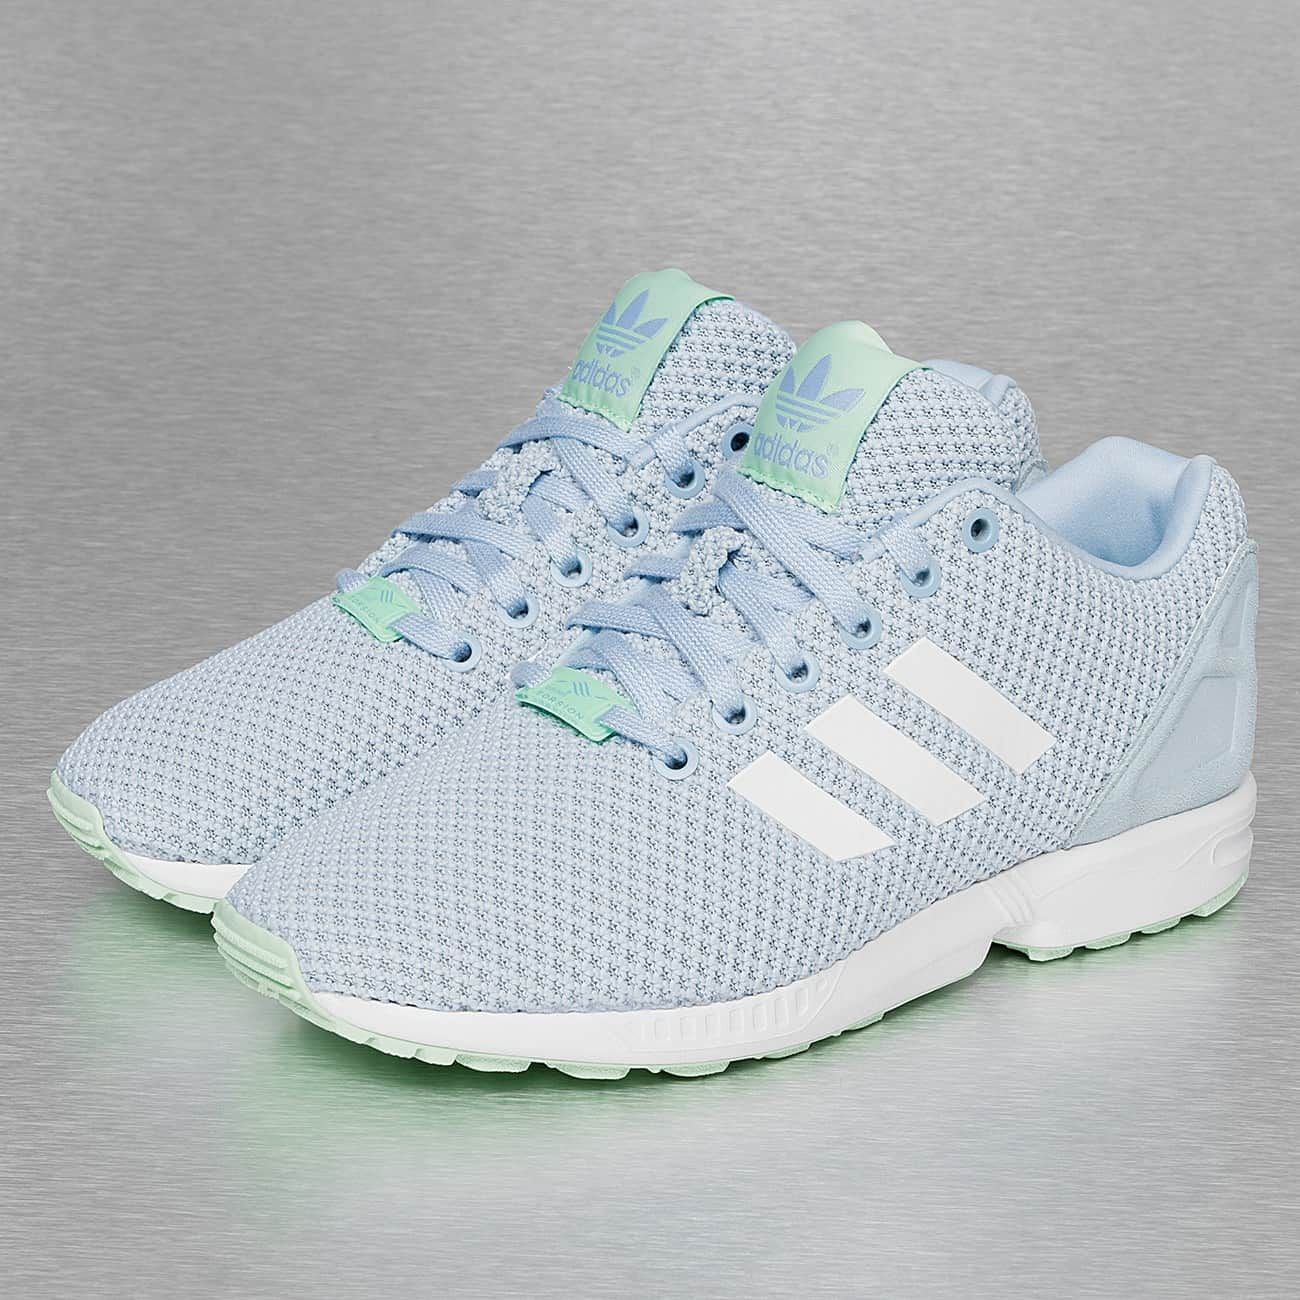 adidas Sneaker blau | Adidas schuhe, Adidas sneaker, Schuhe ...